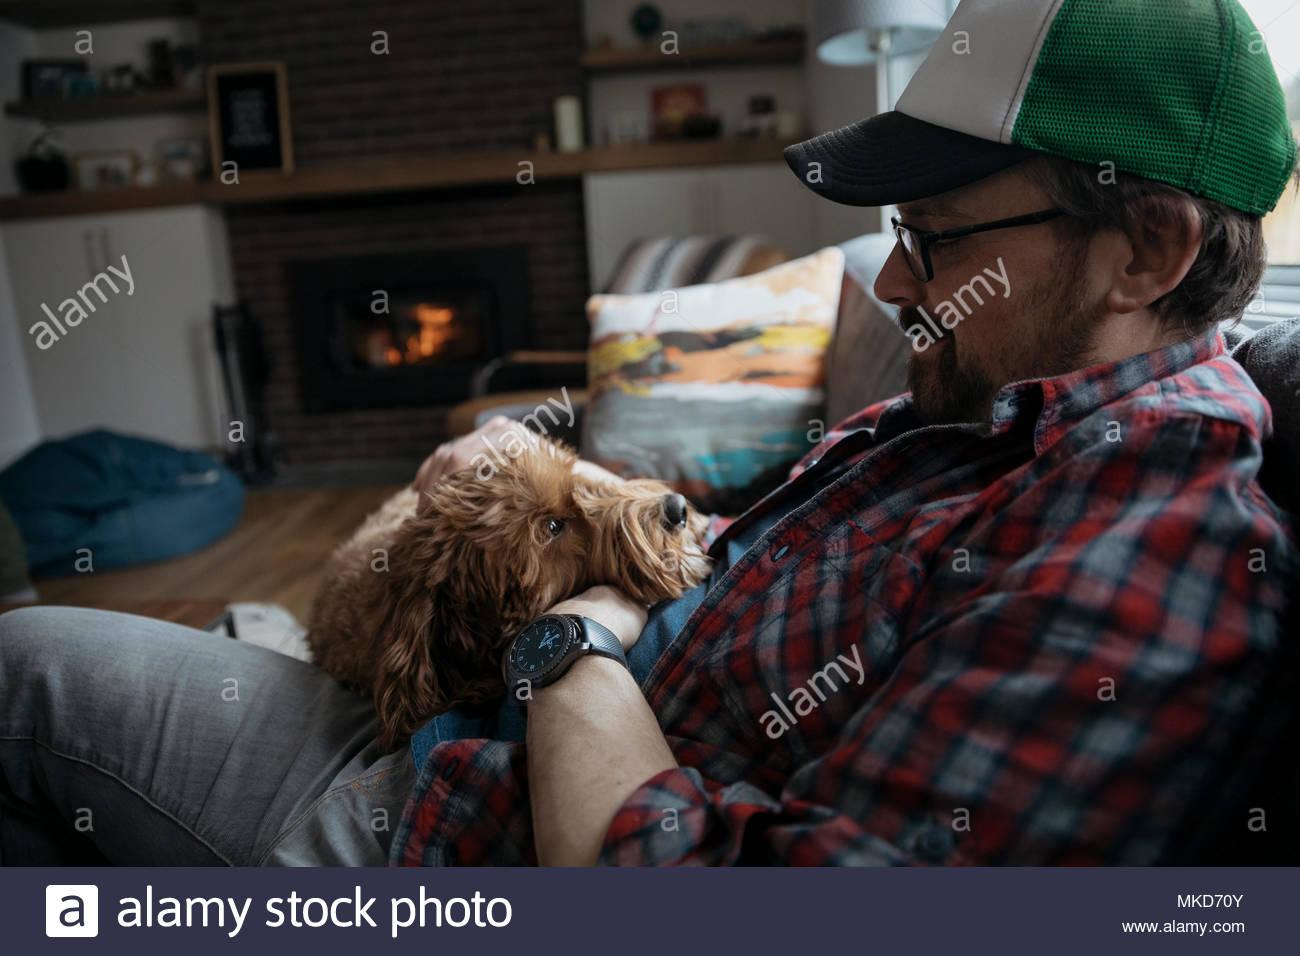 Man petting cute dog on living room sofa - Stock Image